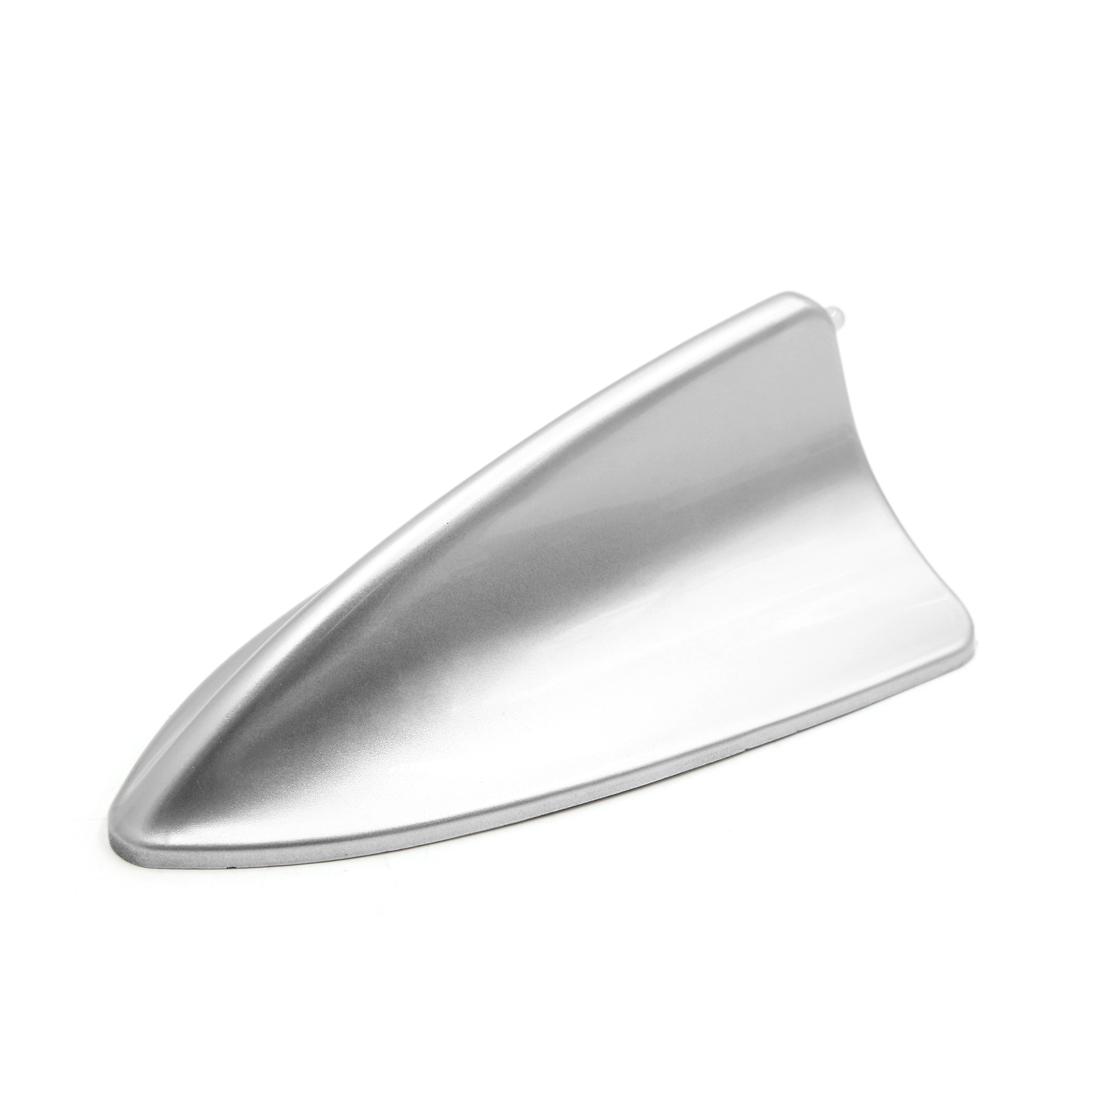 Universal Auto Car Silver Tone Plastic Shark Fin Roof Decorative Antenna Aerial